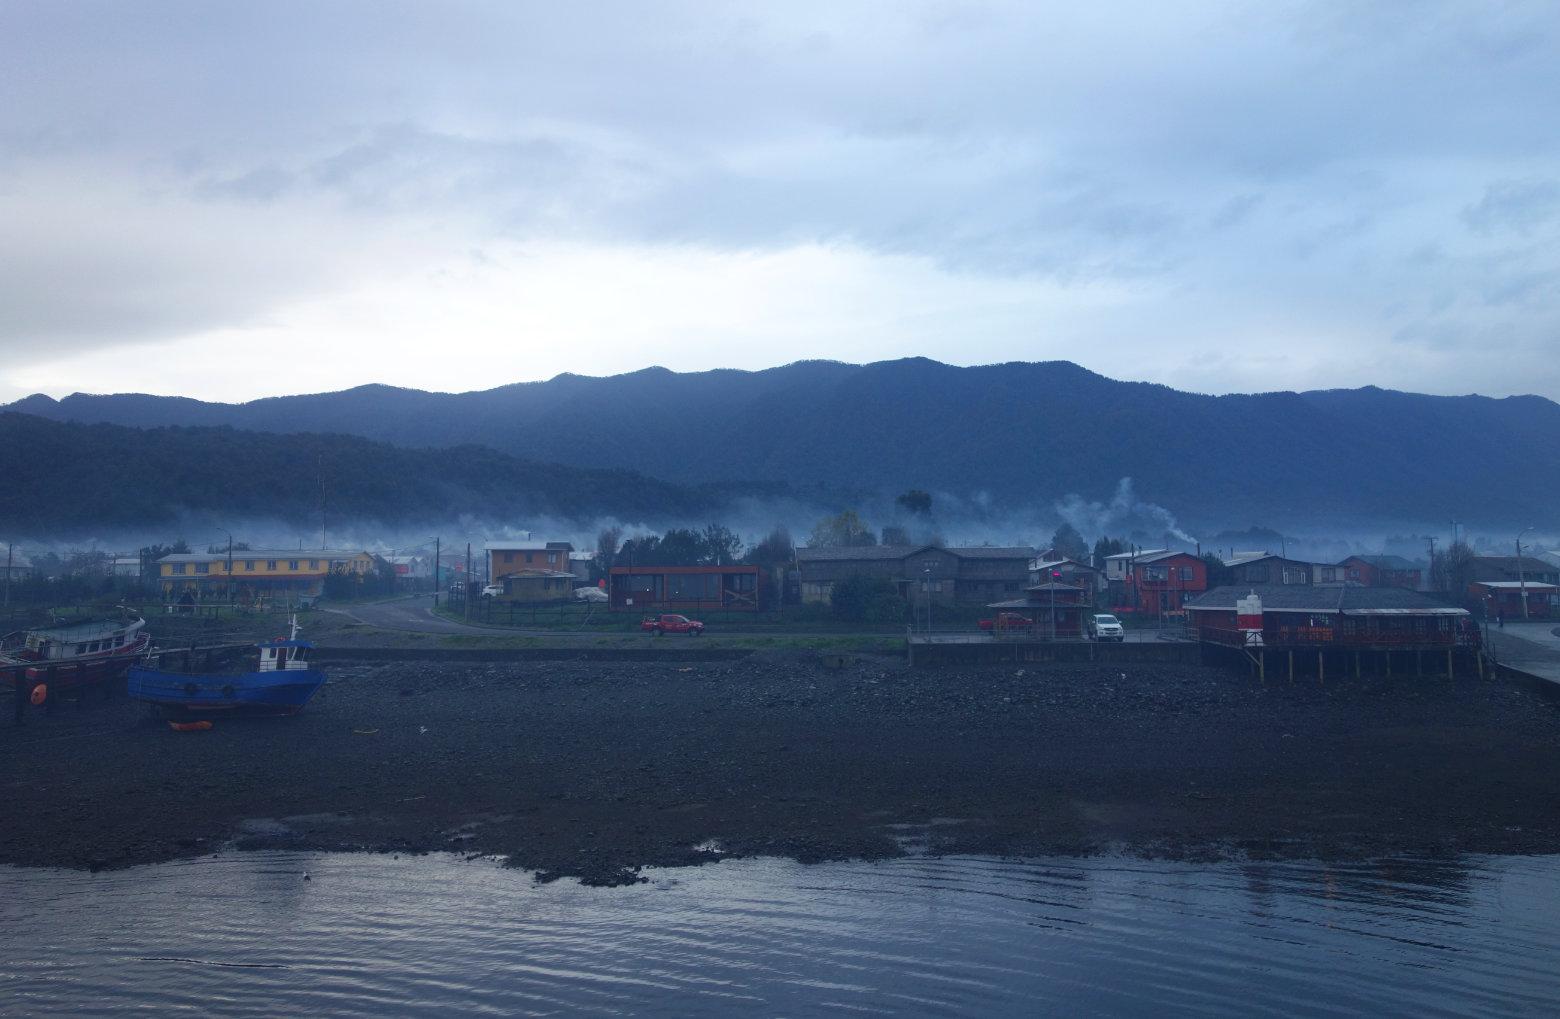 Chile Carretera Austral Hornopiren